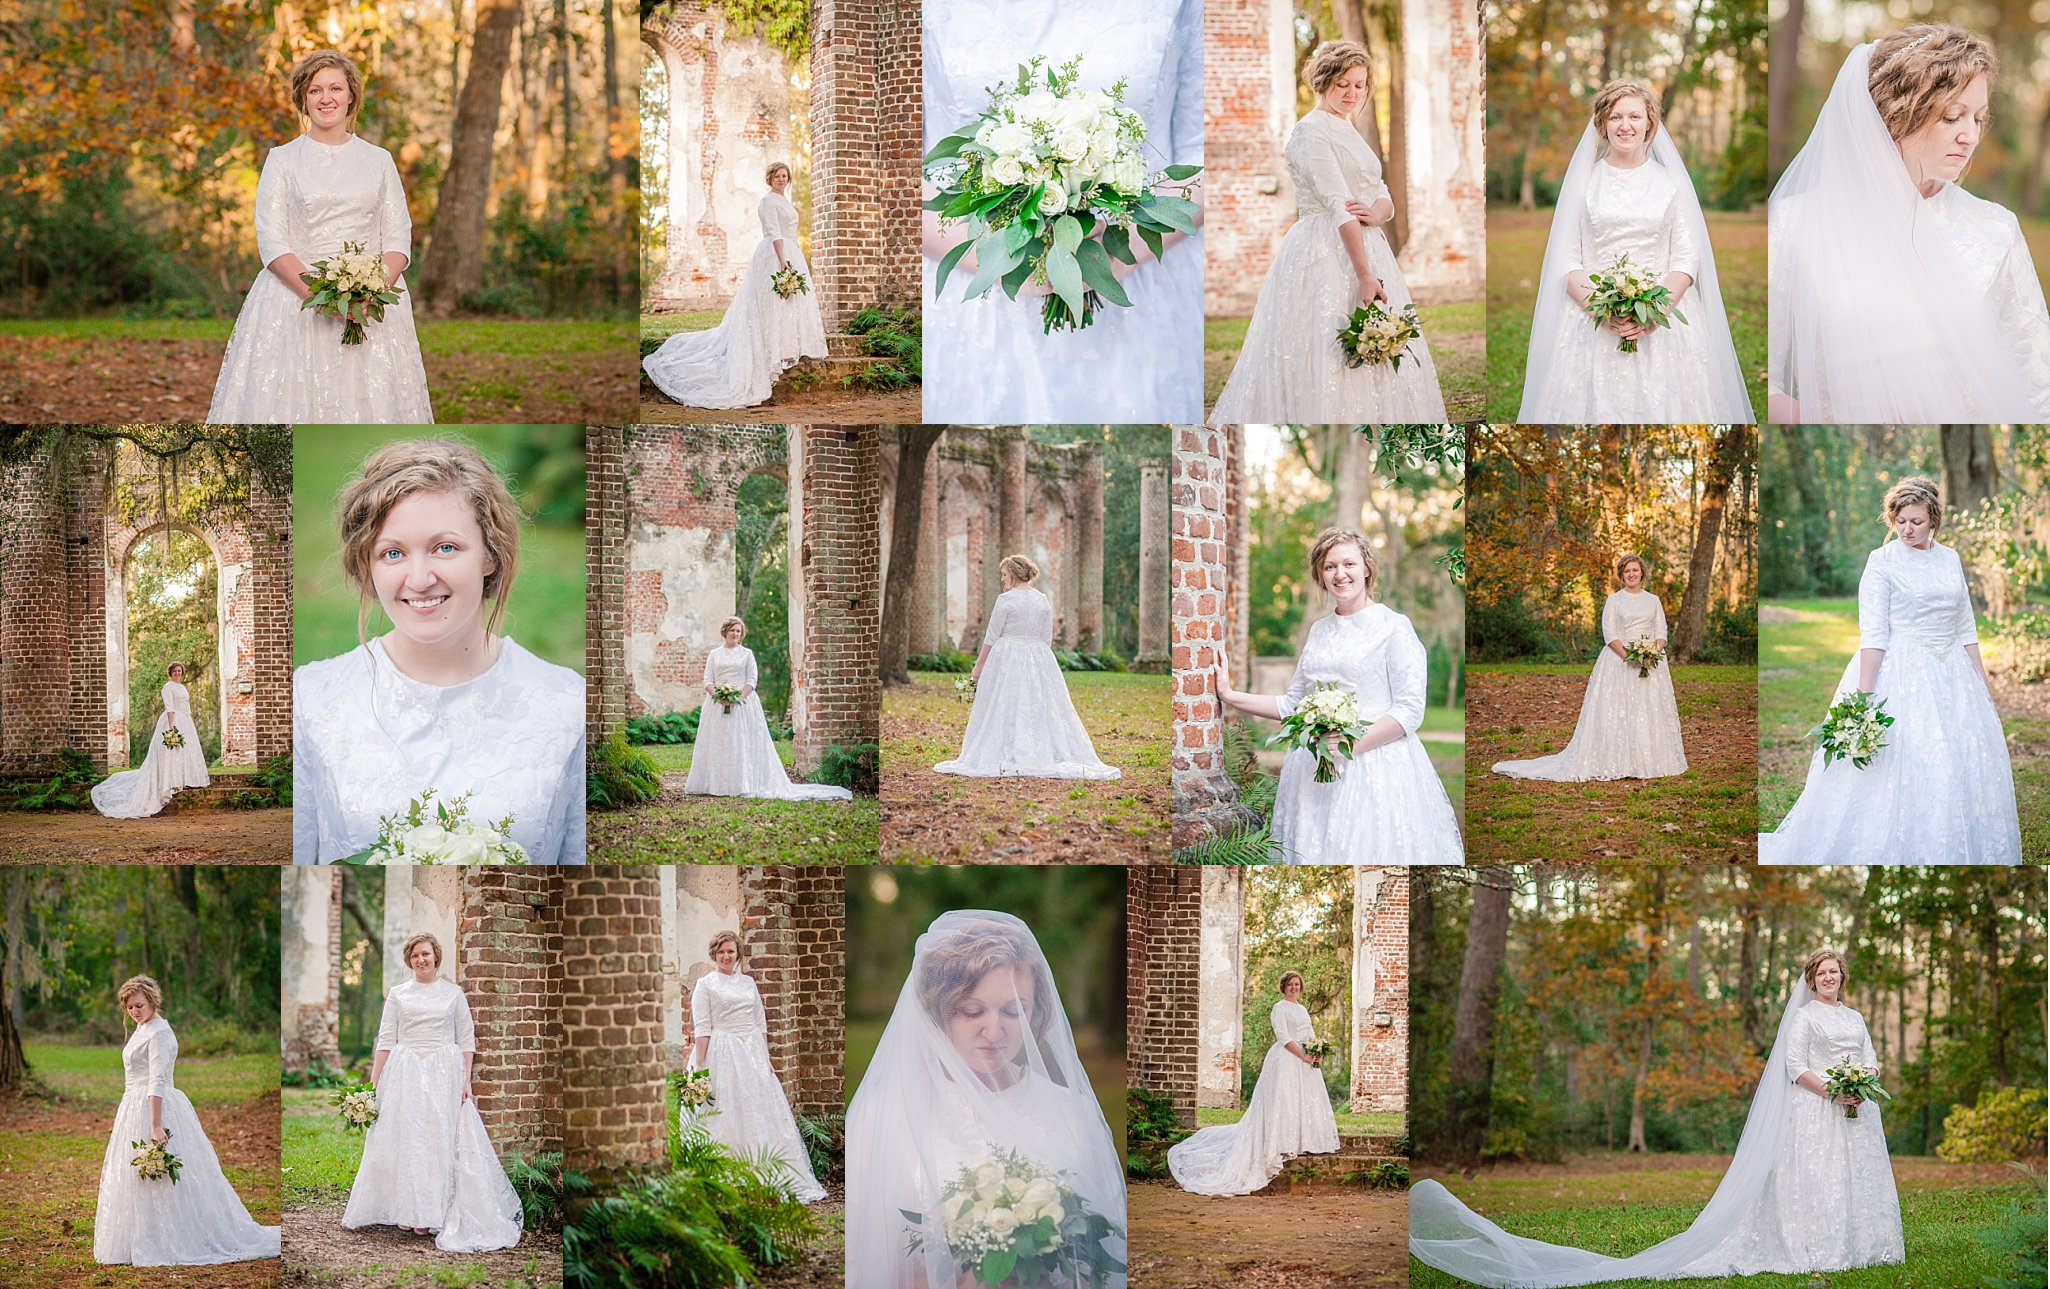 Kylie Floyd (Brown) Bridal Portraits Old Sheldon Church Ruins